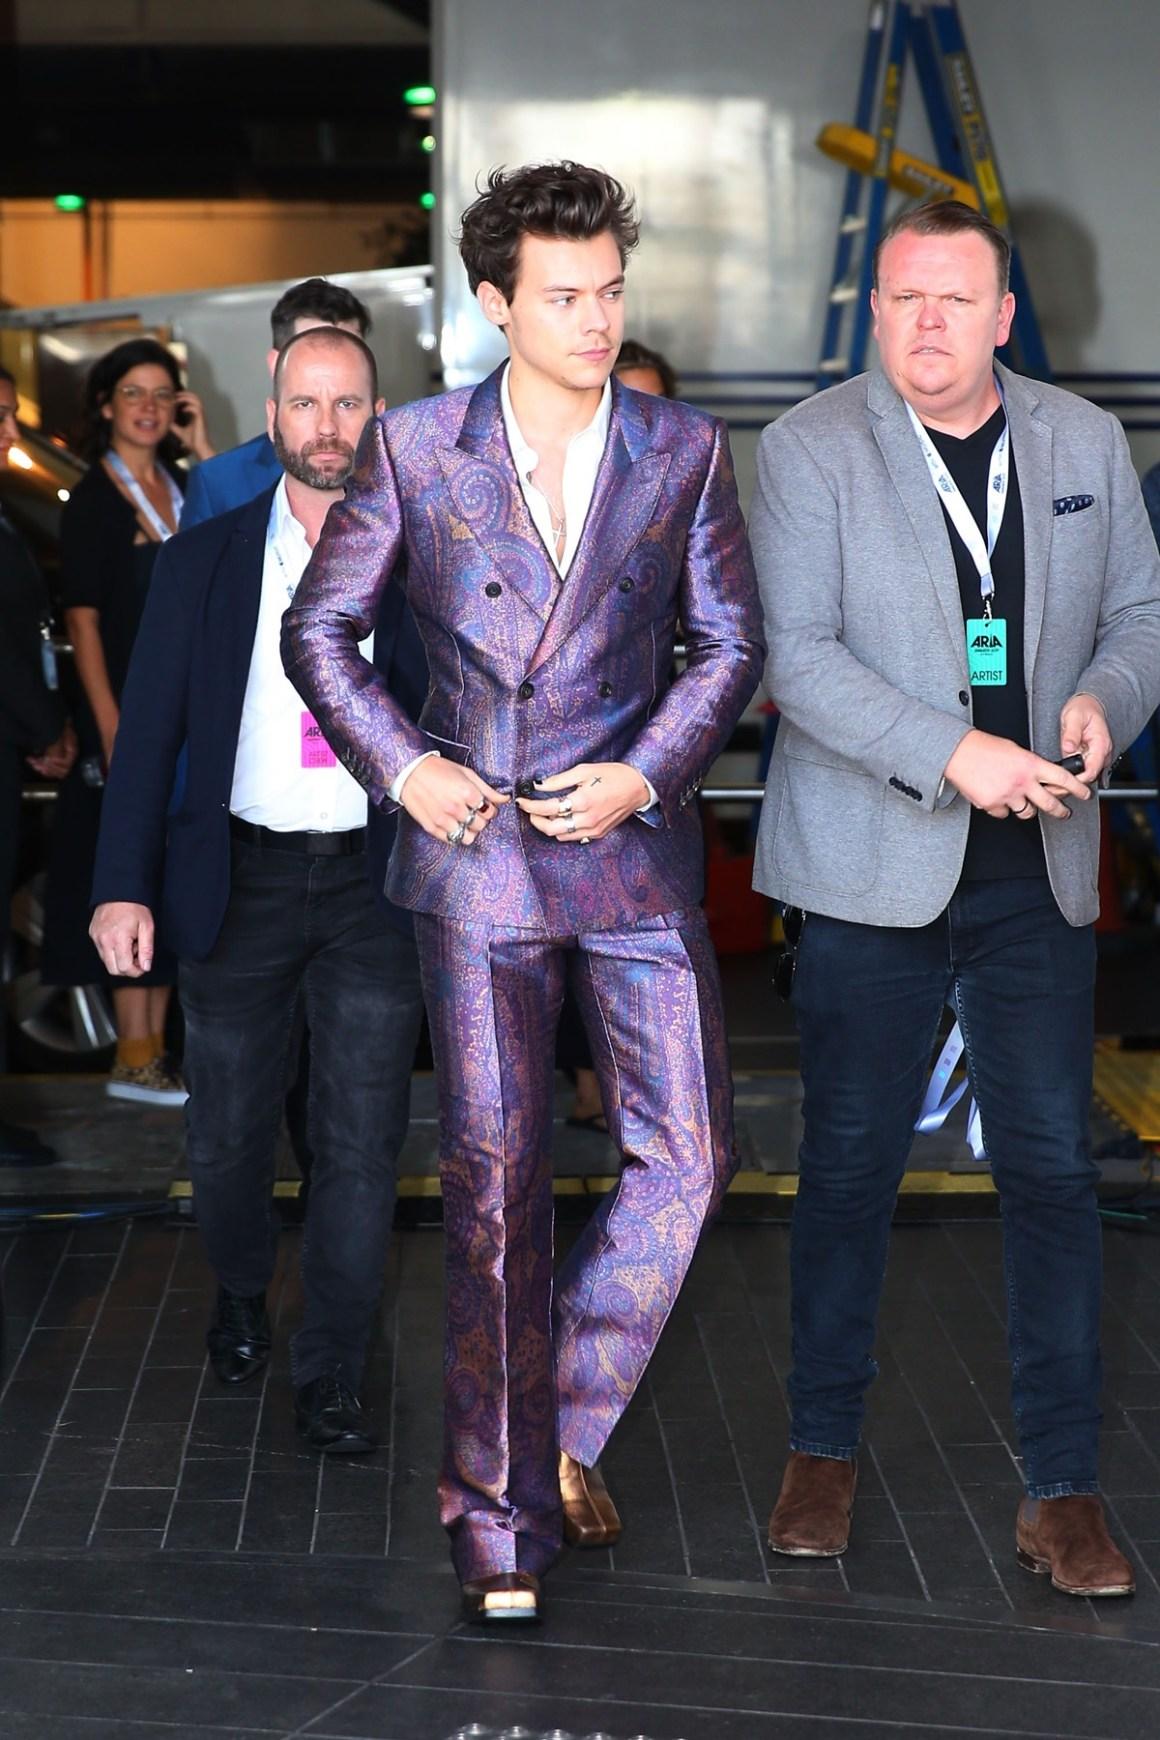 31st Annual ARIA Awards 2017 - Arrivals